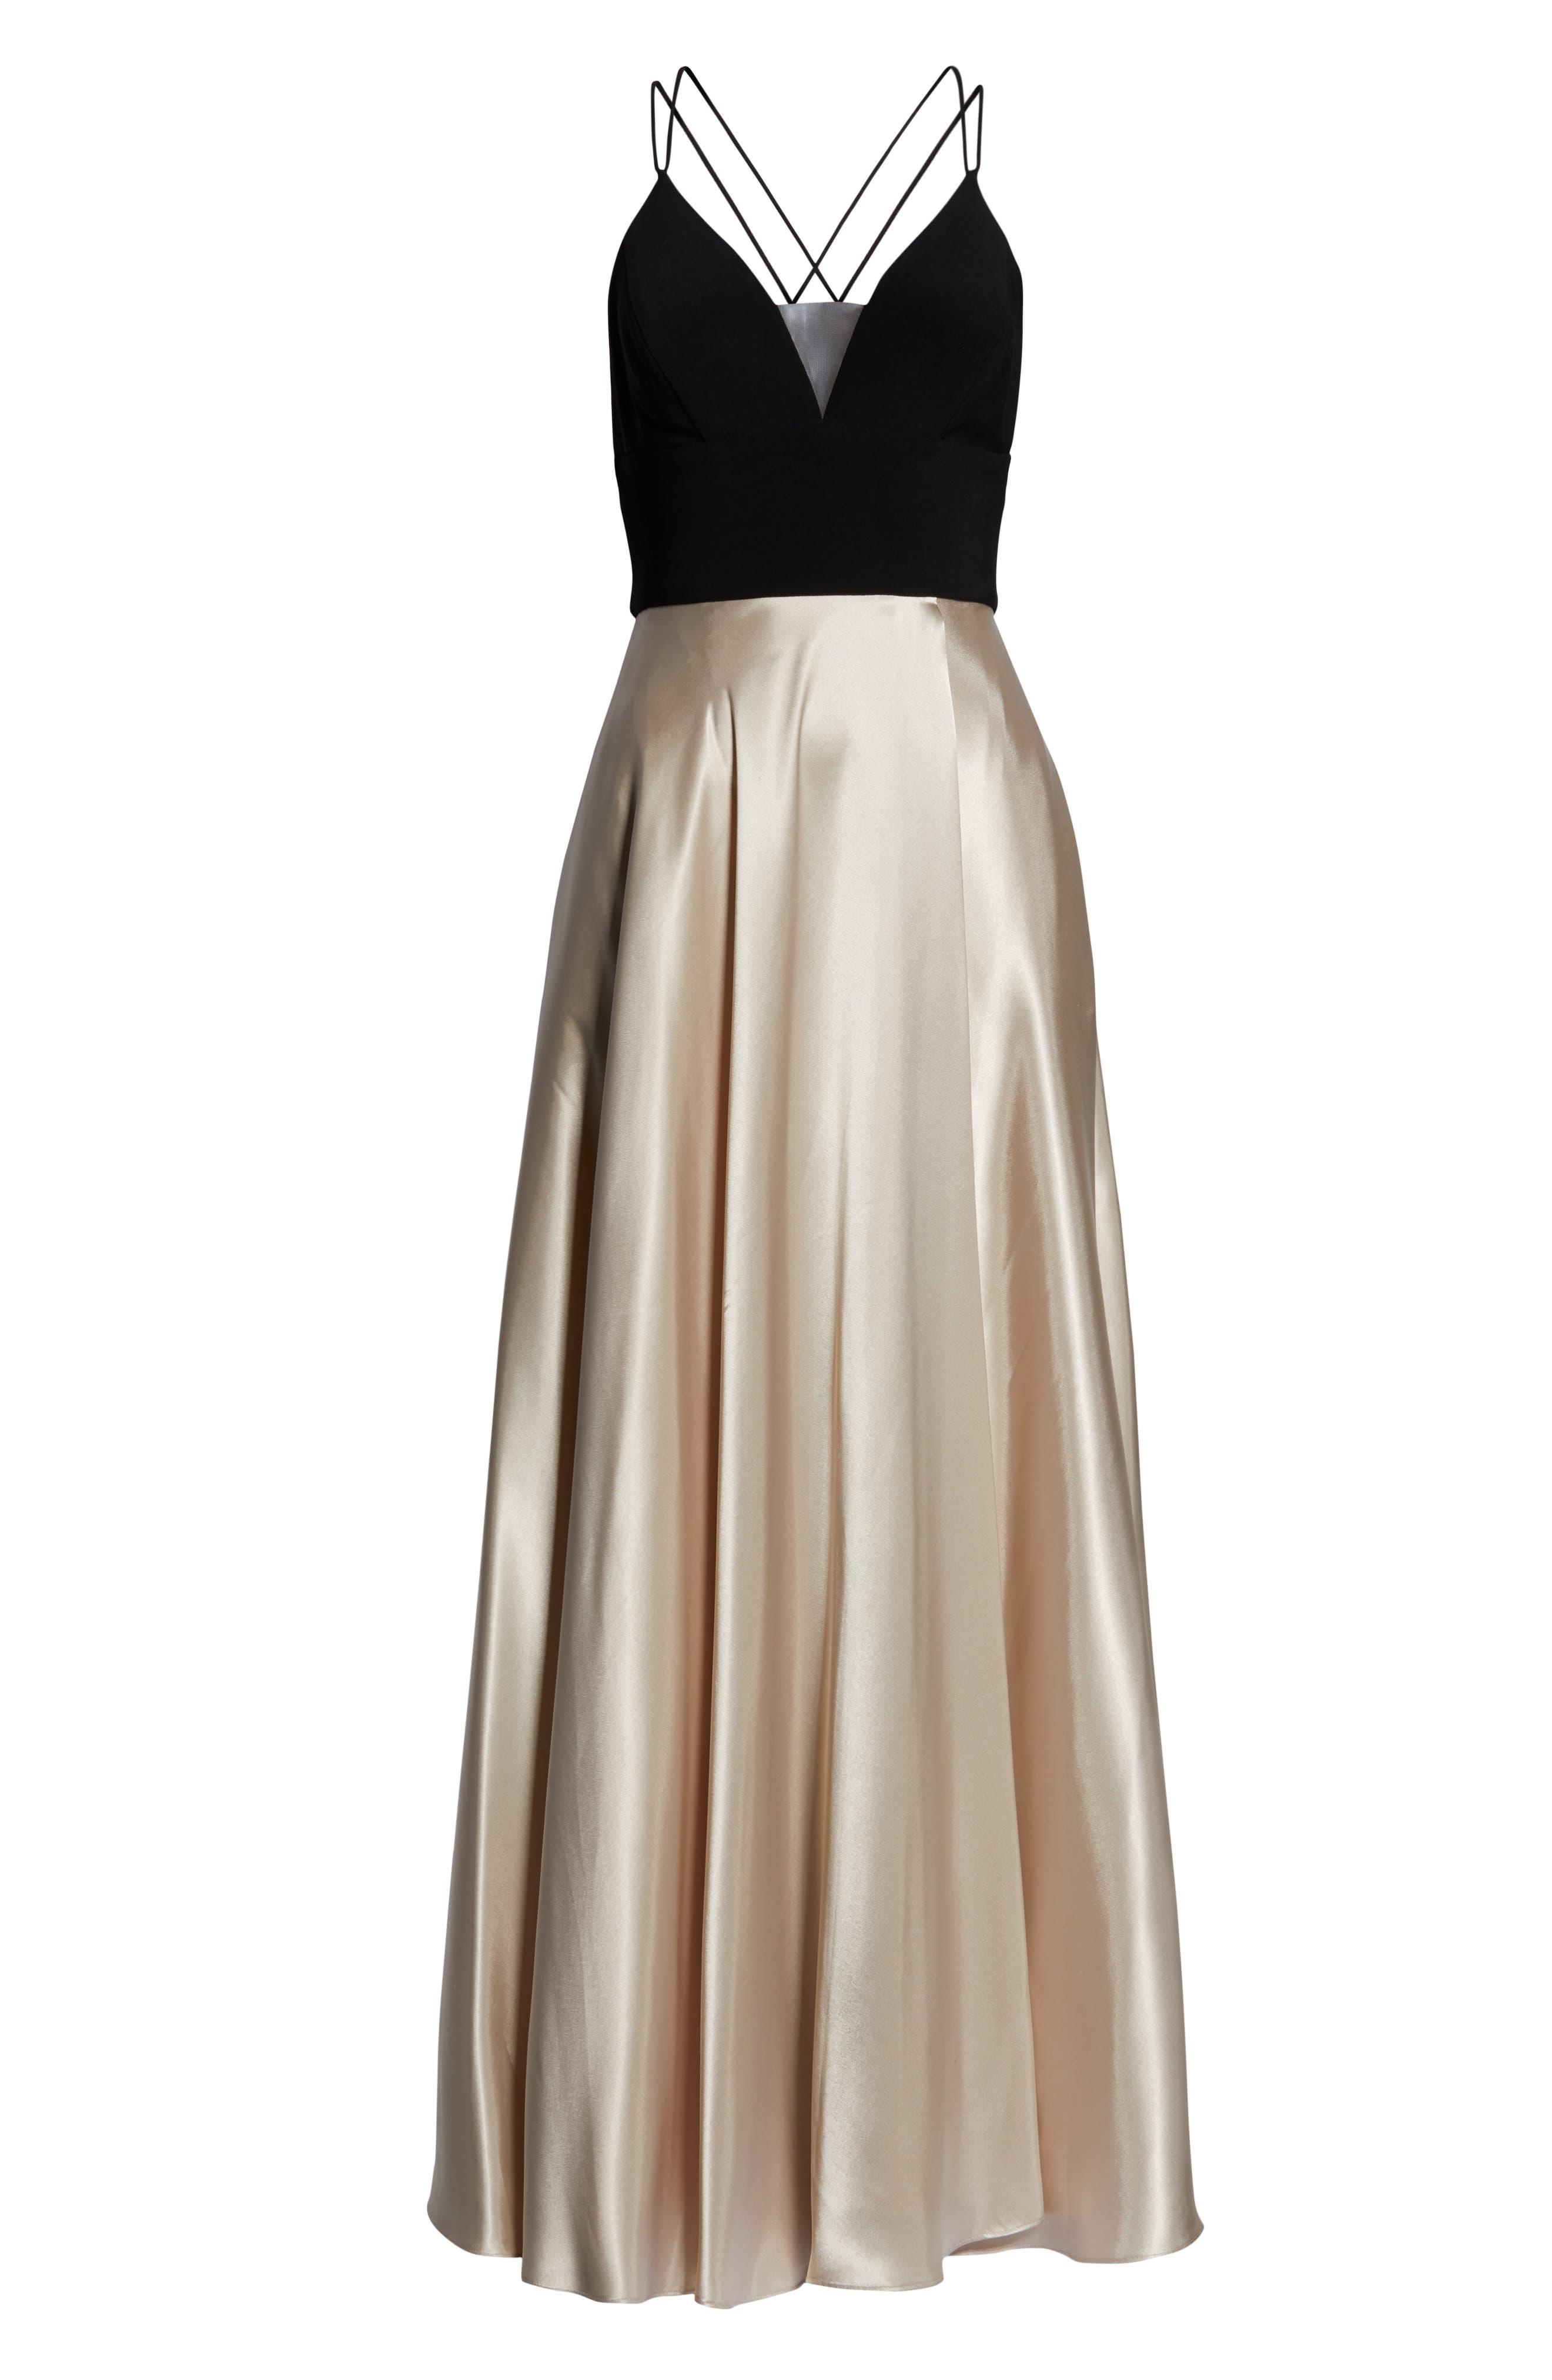 BLONDIE NITES, Strappy Back Crepe & Charmeuse Evening Dress, Alternate thumbnail 7, color, BLACK/ GOLD